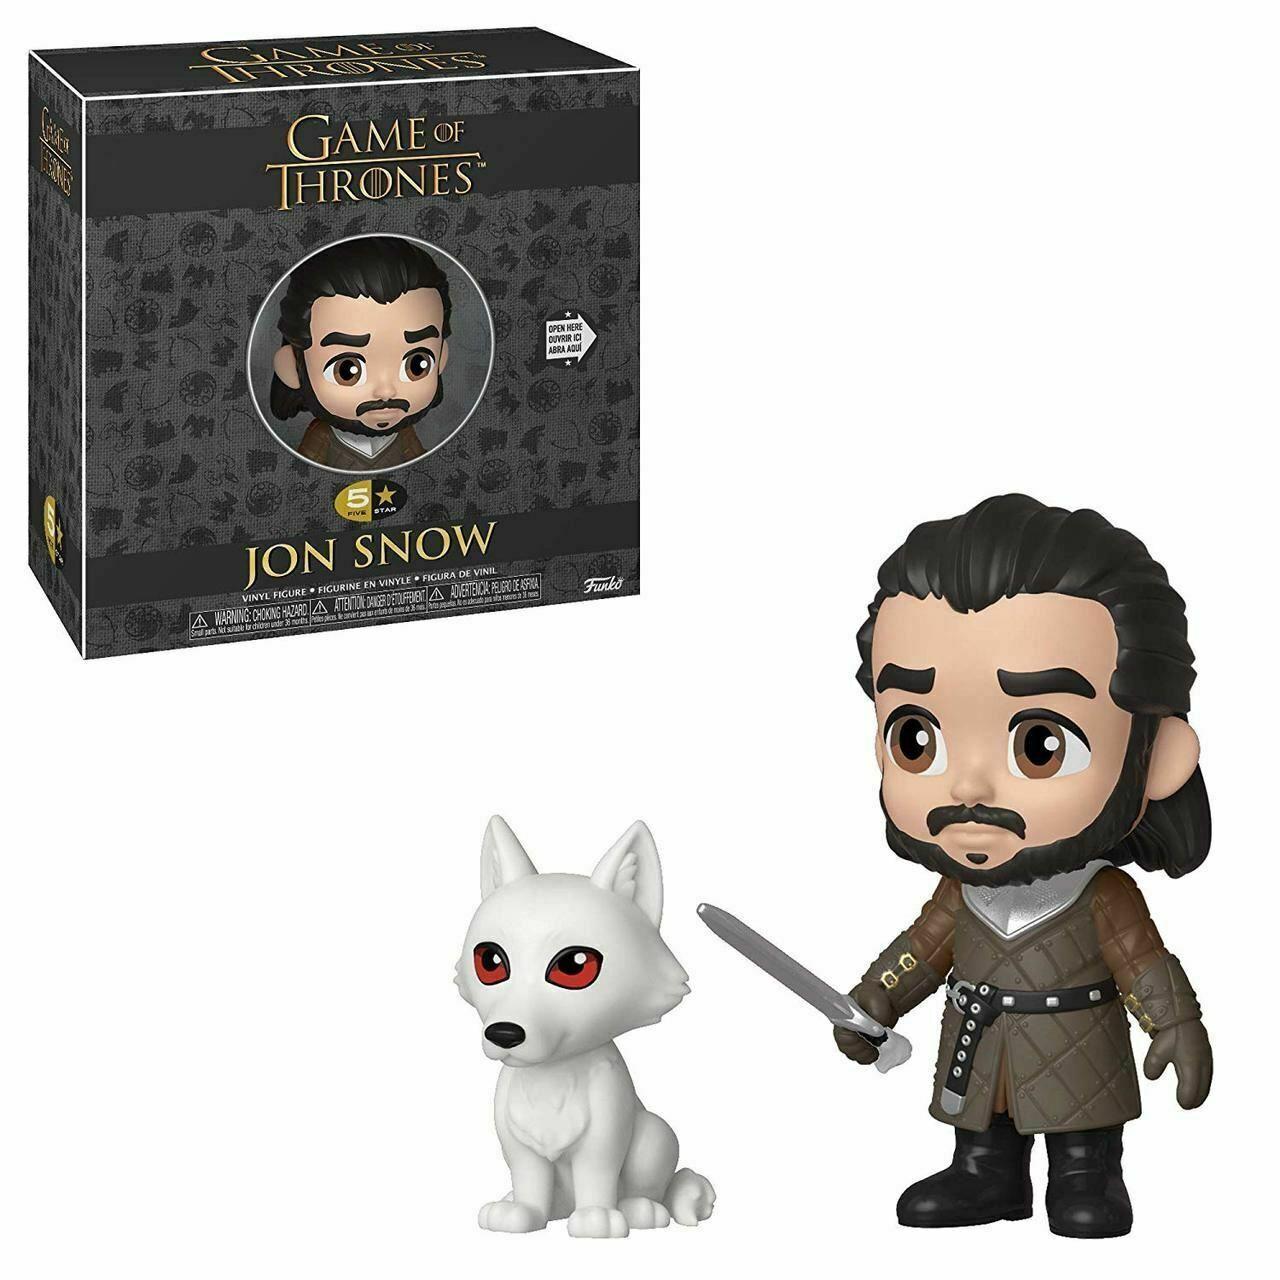 Funko Boneco Jon Snow: Game of Thrones (5 Star) - Funko